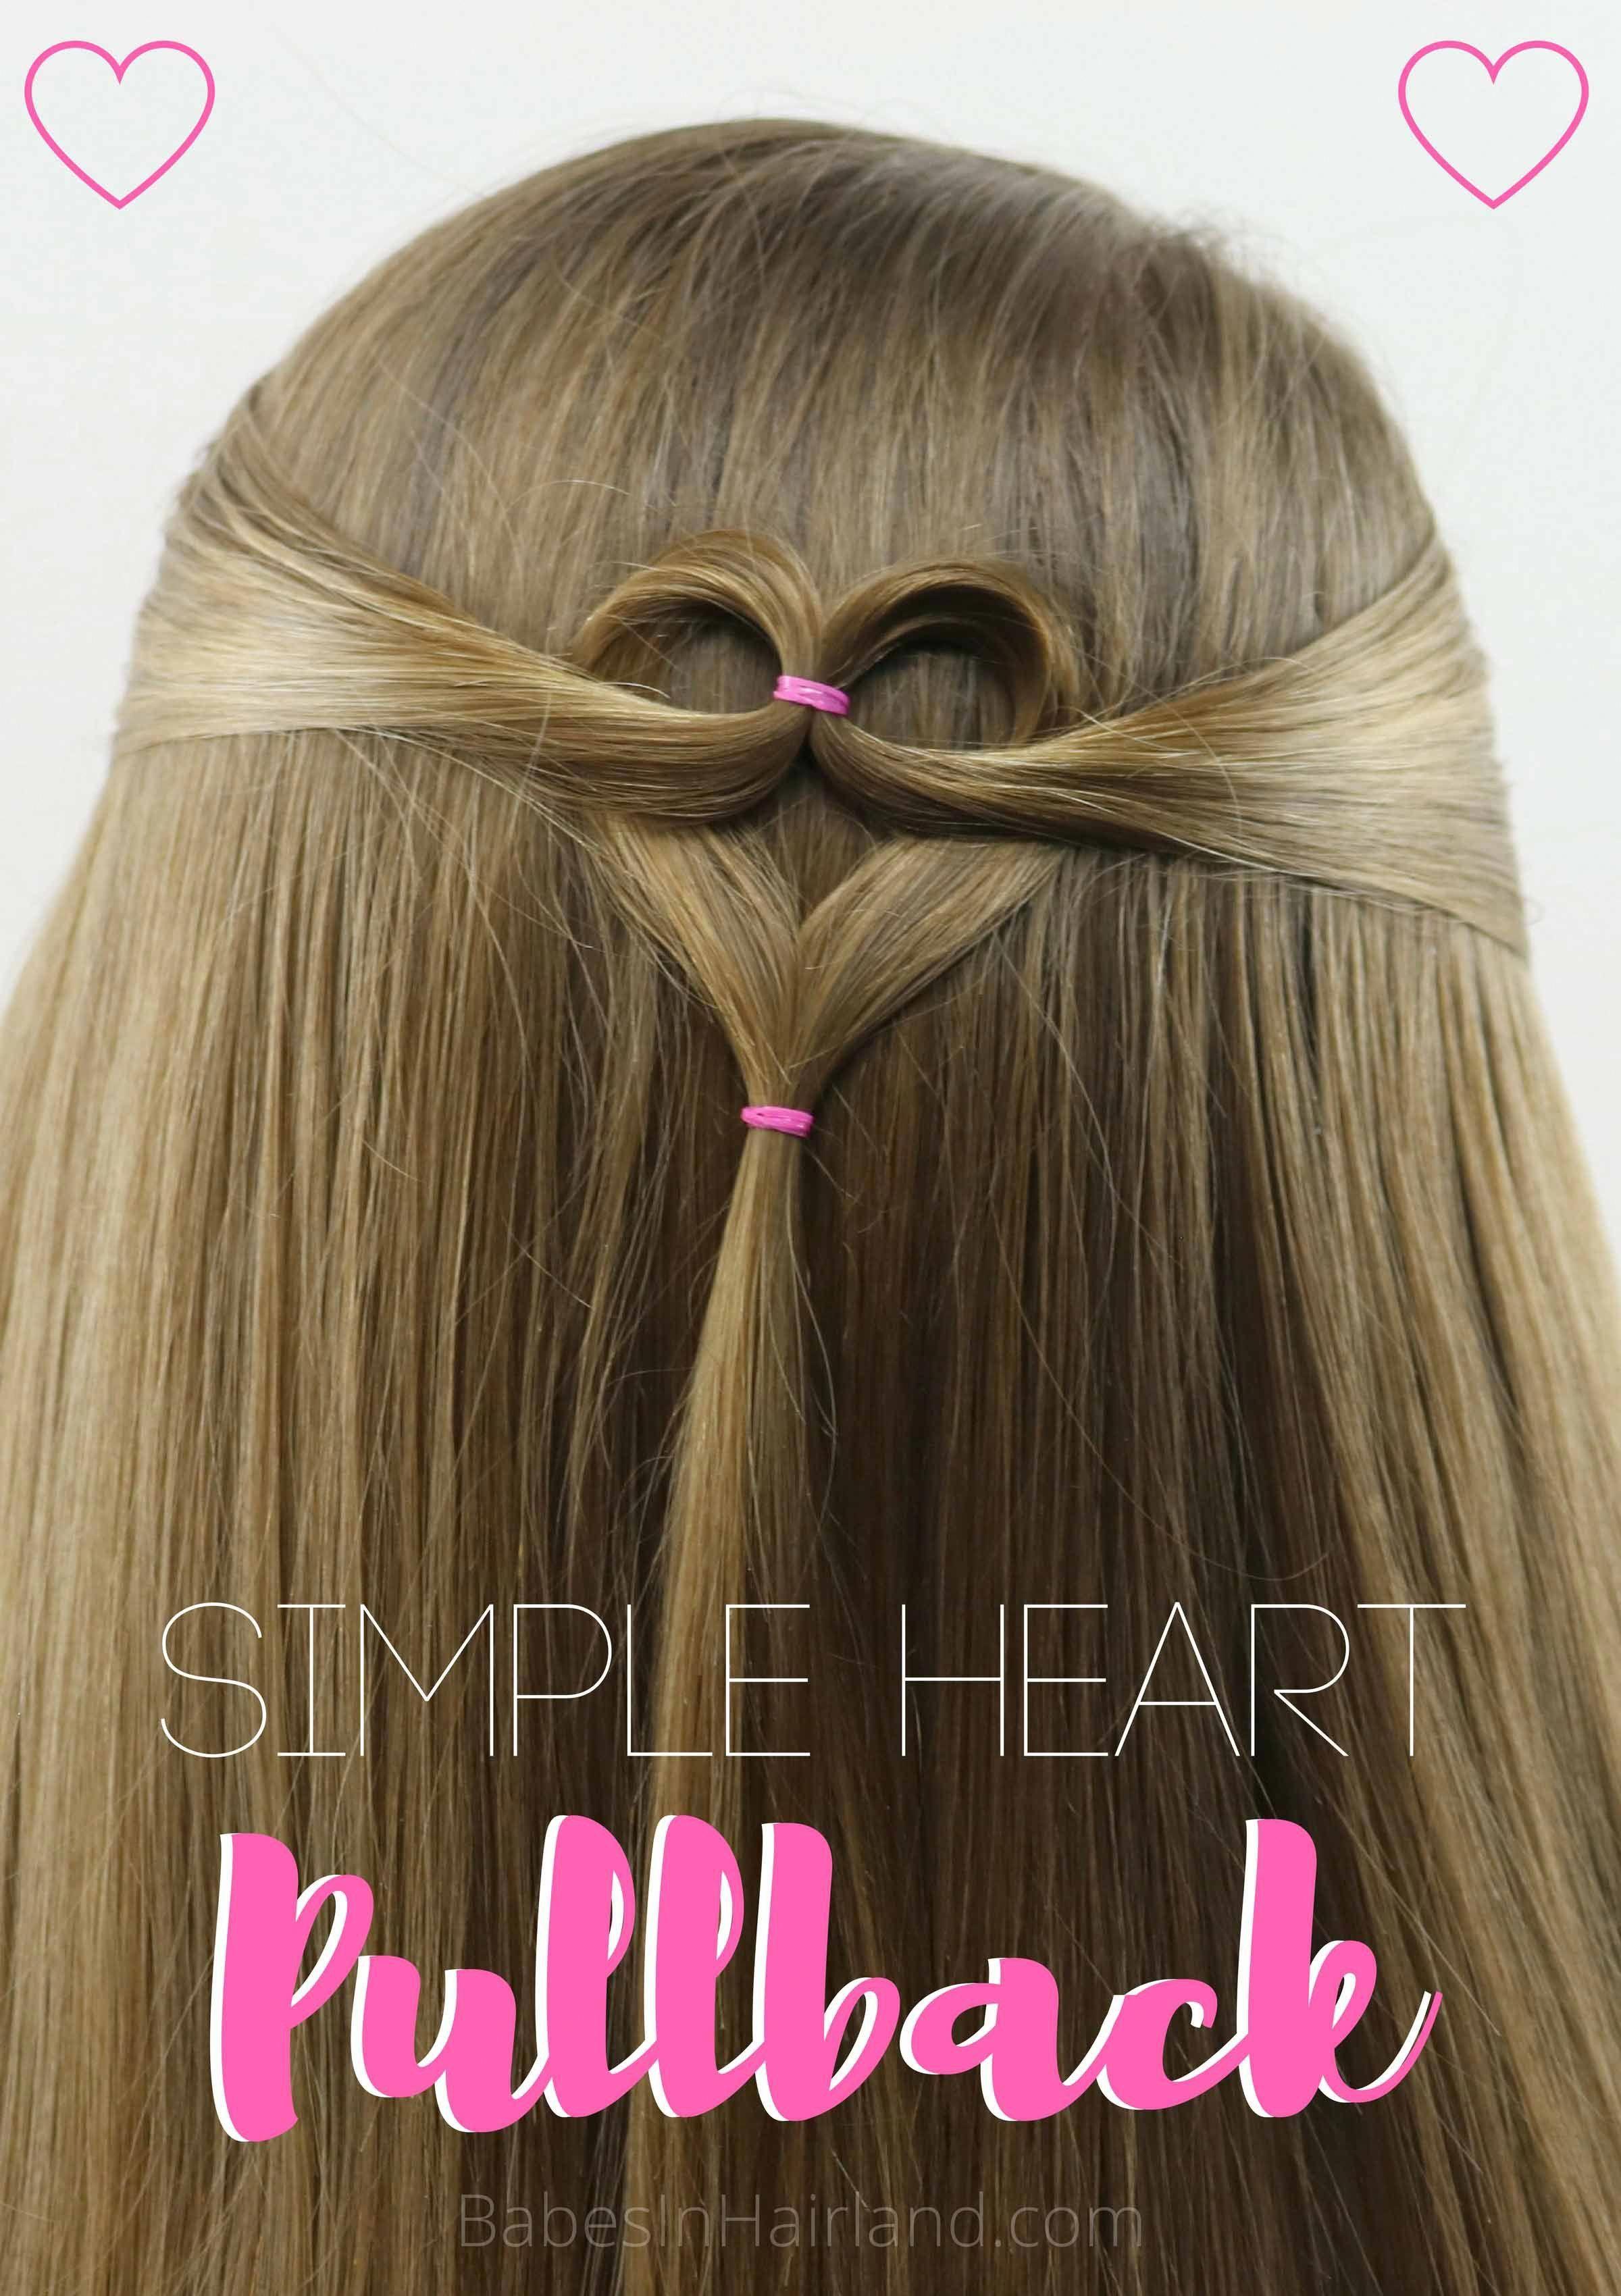 Triple Heart Pullback Cute Simple Valentine S Day Hairstyle In 2020 Valentine S Day Hairstyles Heart Hair Cute Hairstyles For Kids